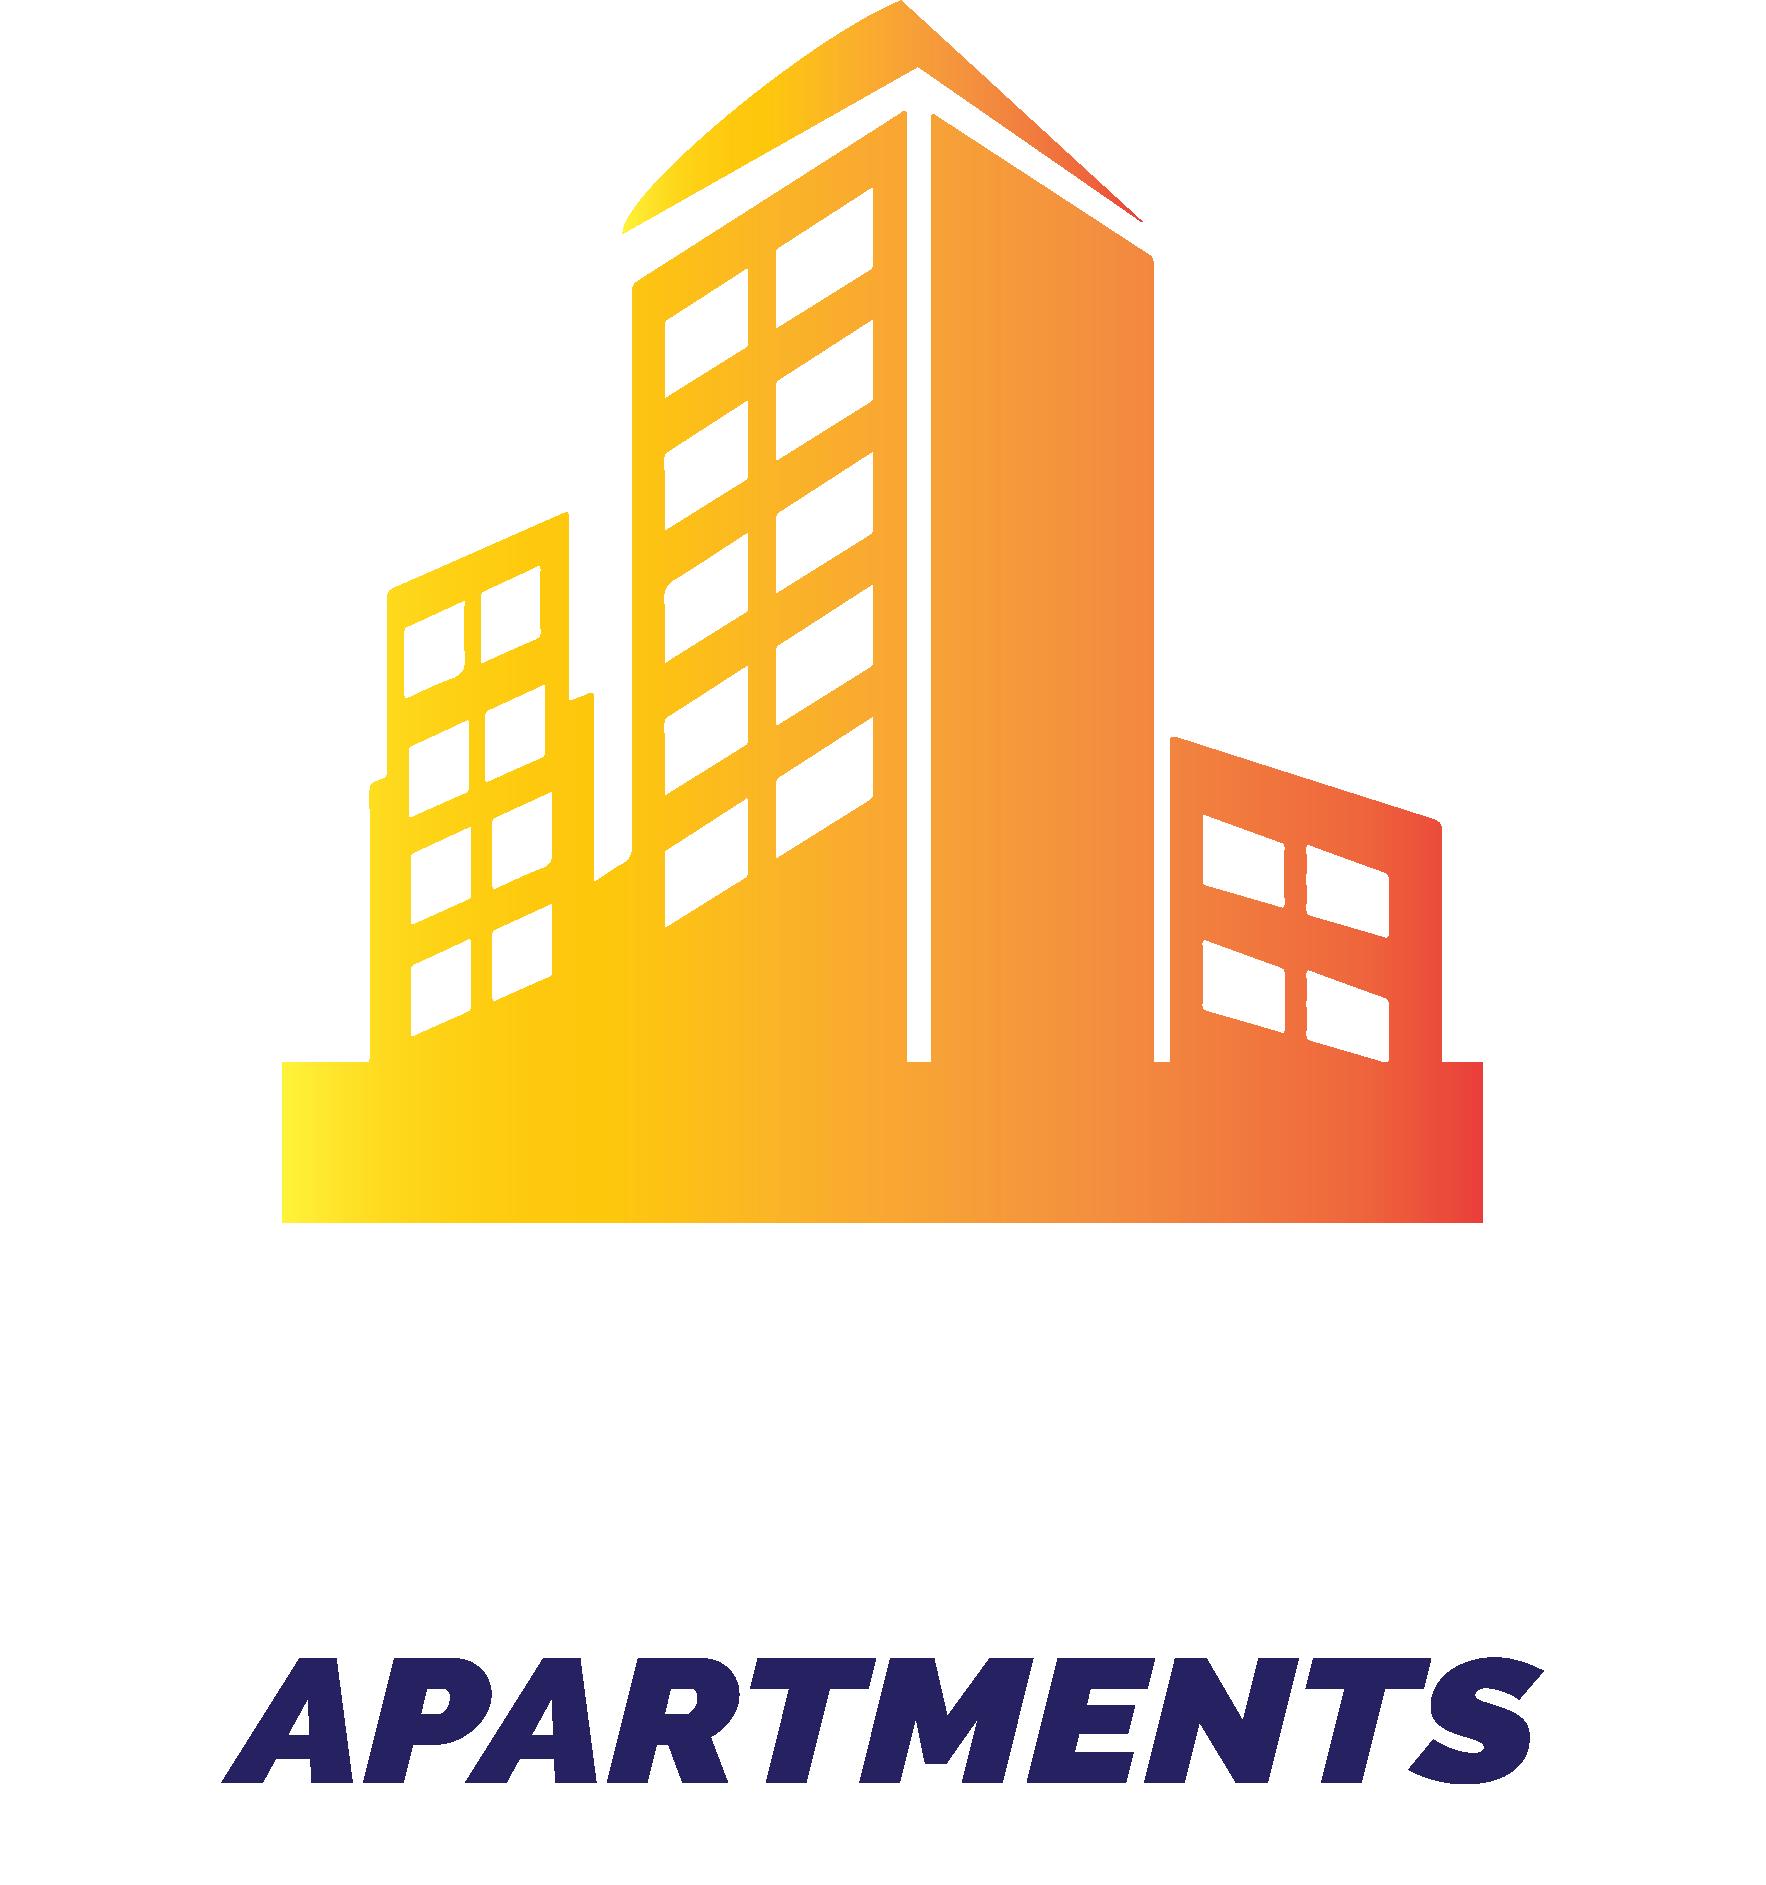 martina's apartments logo lagos nigeria